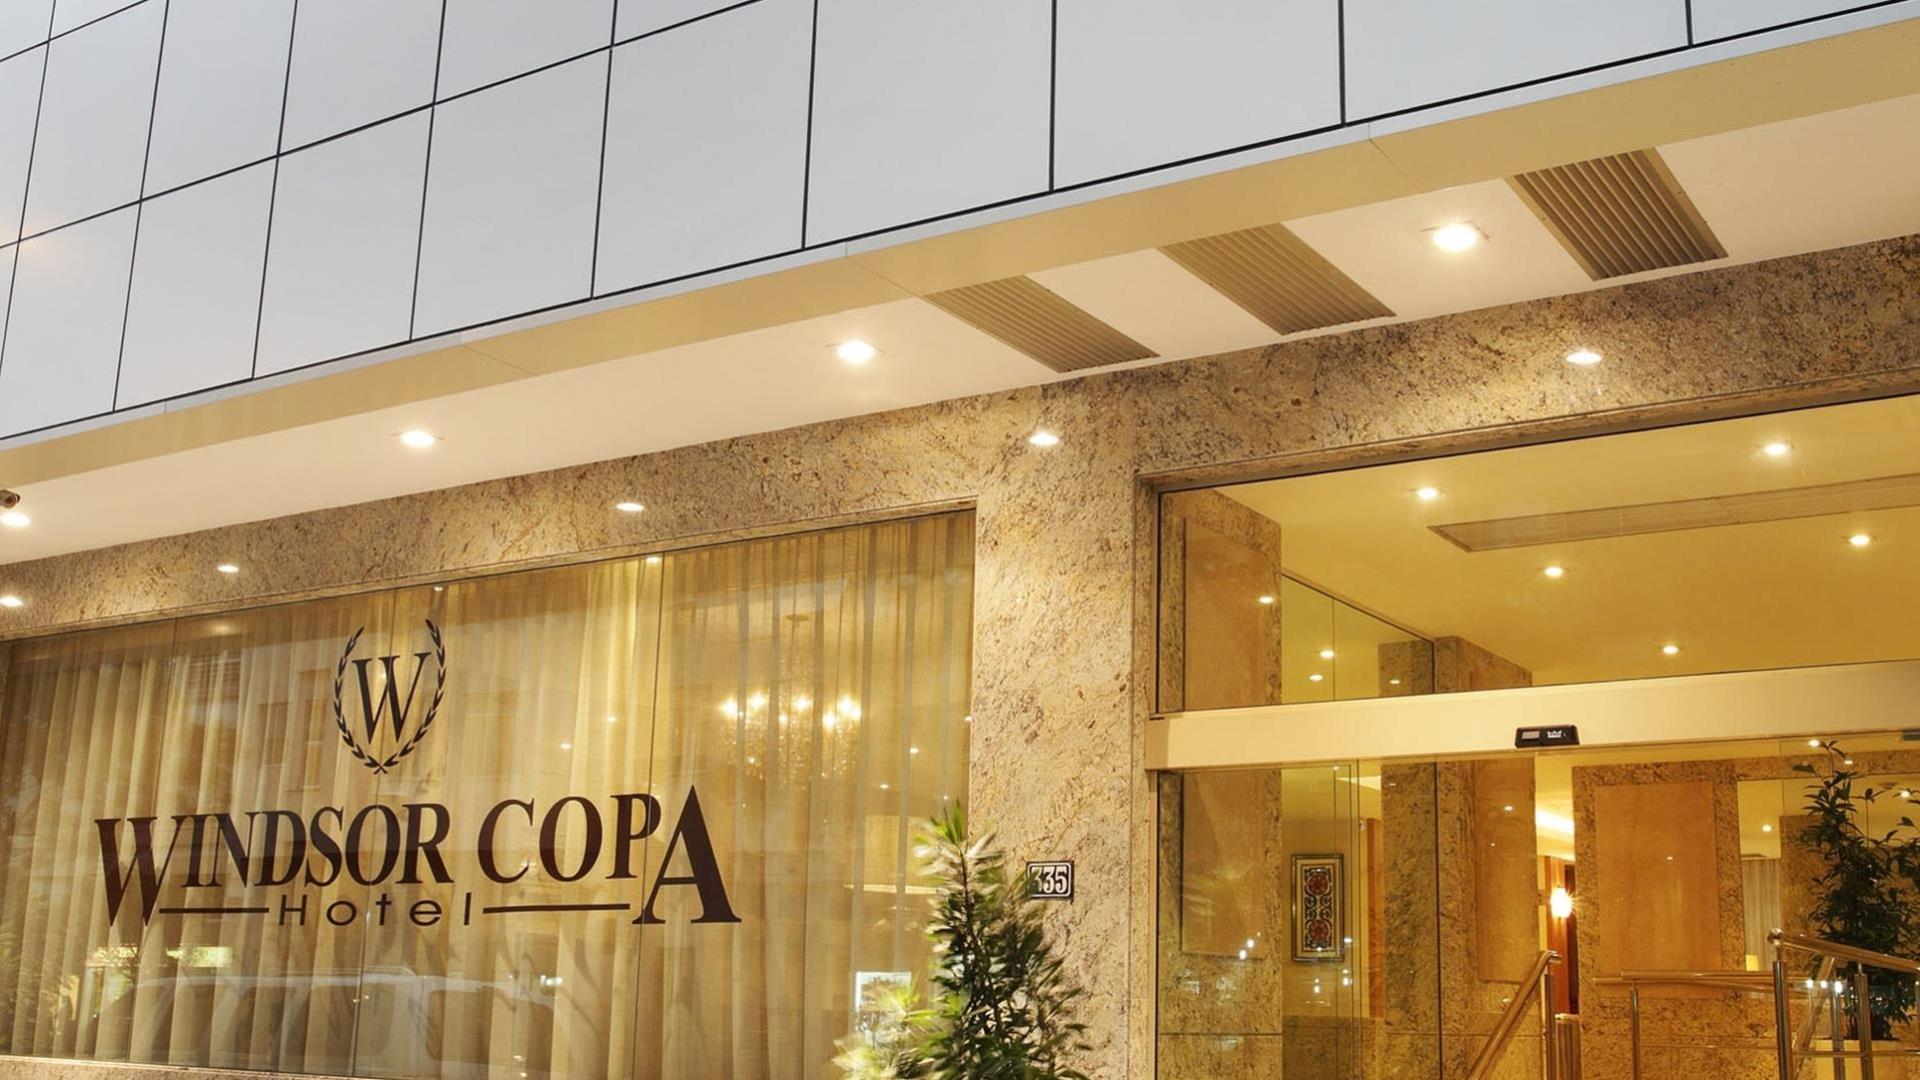 Brasilien Rio de Janeiro: Standard Hotel - Hotel Windsor Copa